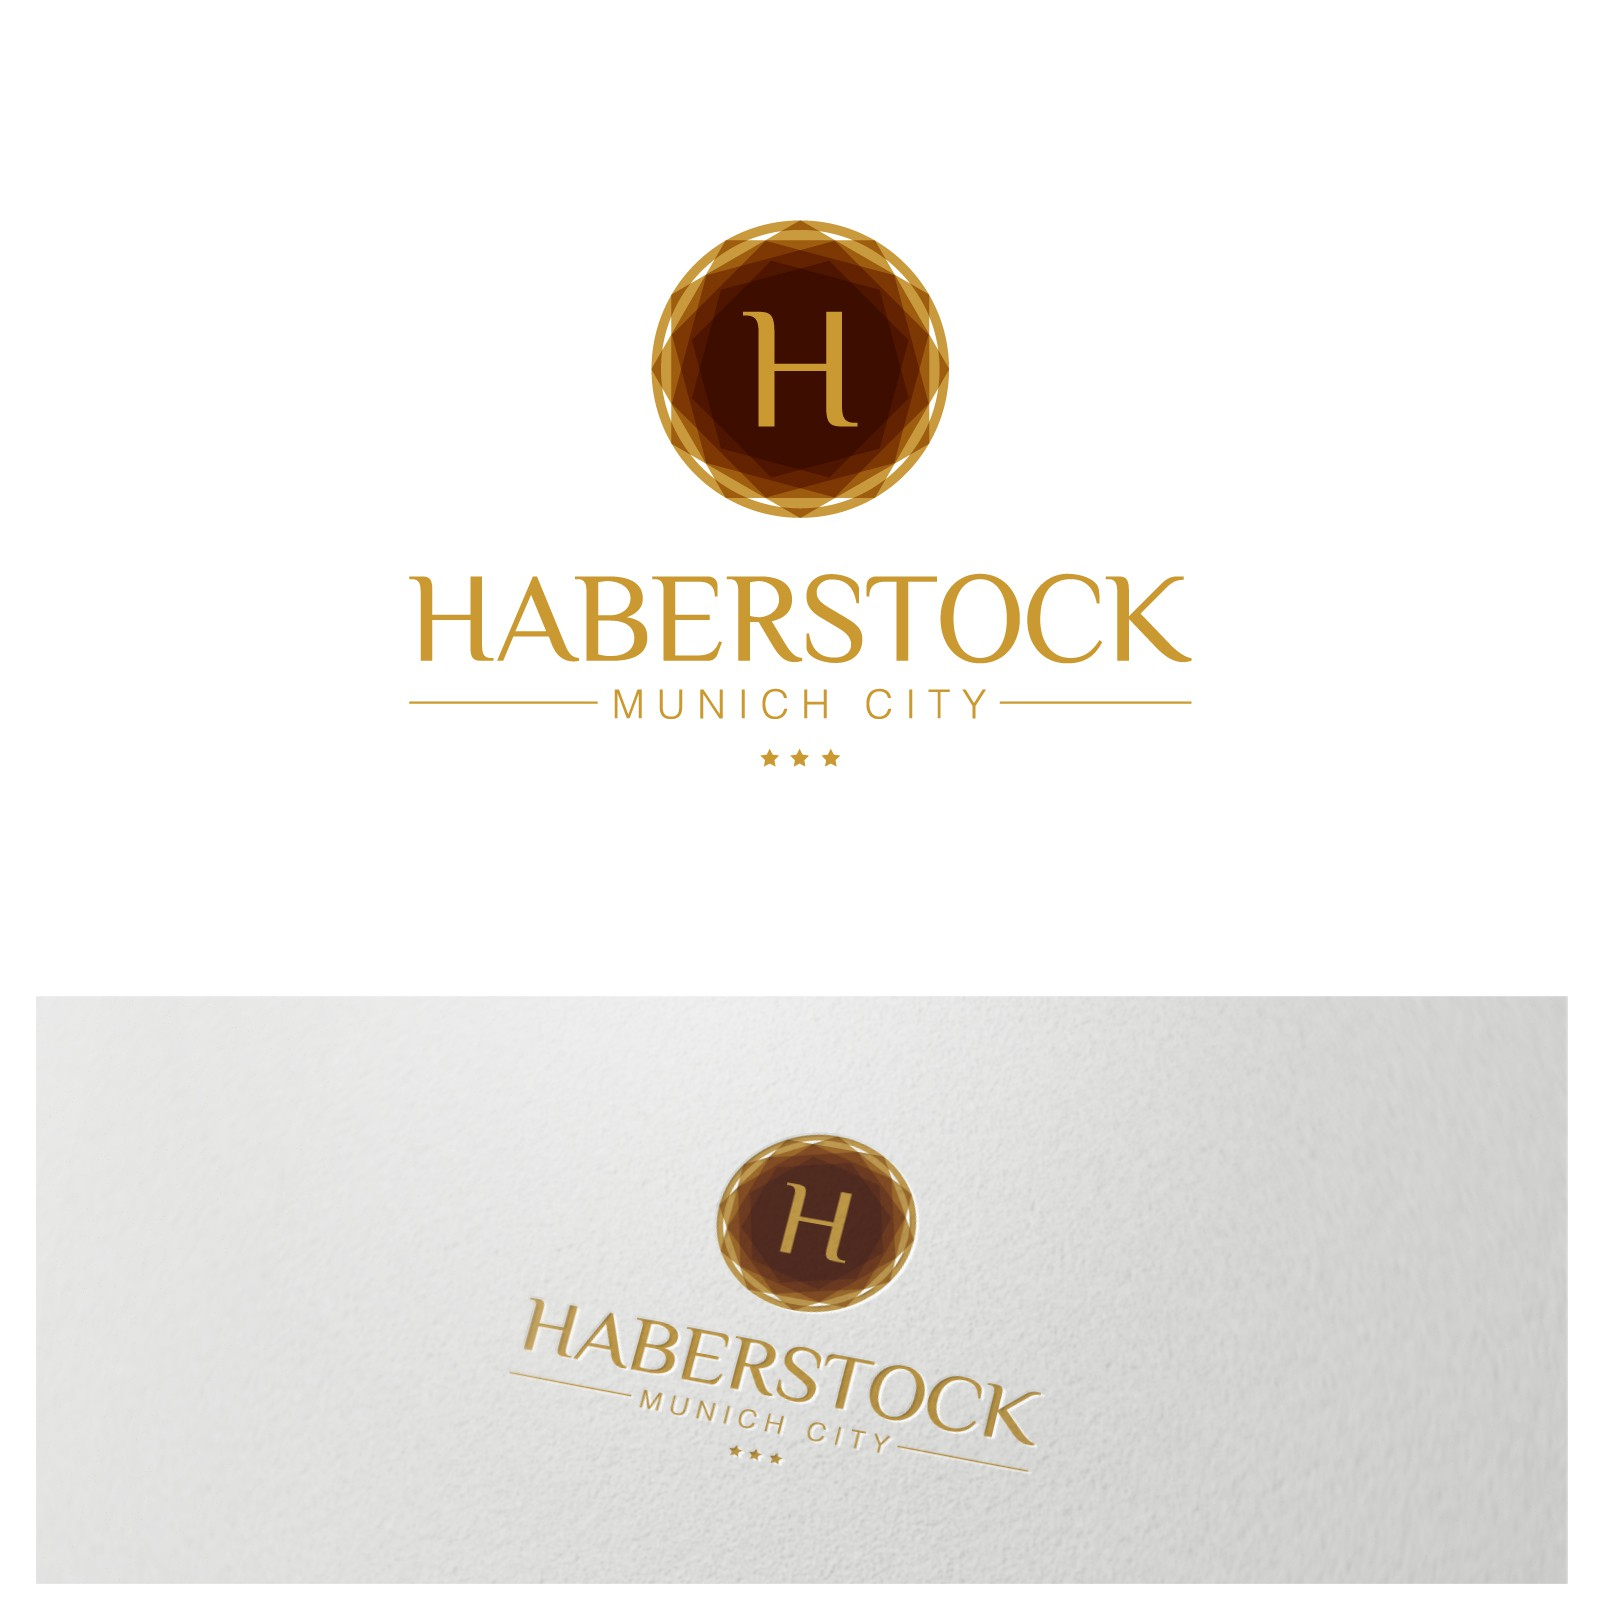 HABERSTOCK Hotel needs a new logo